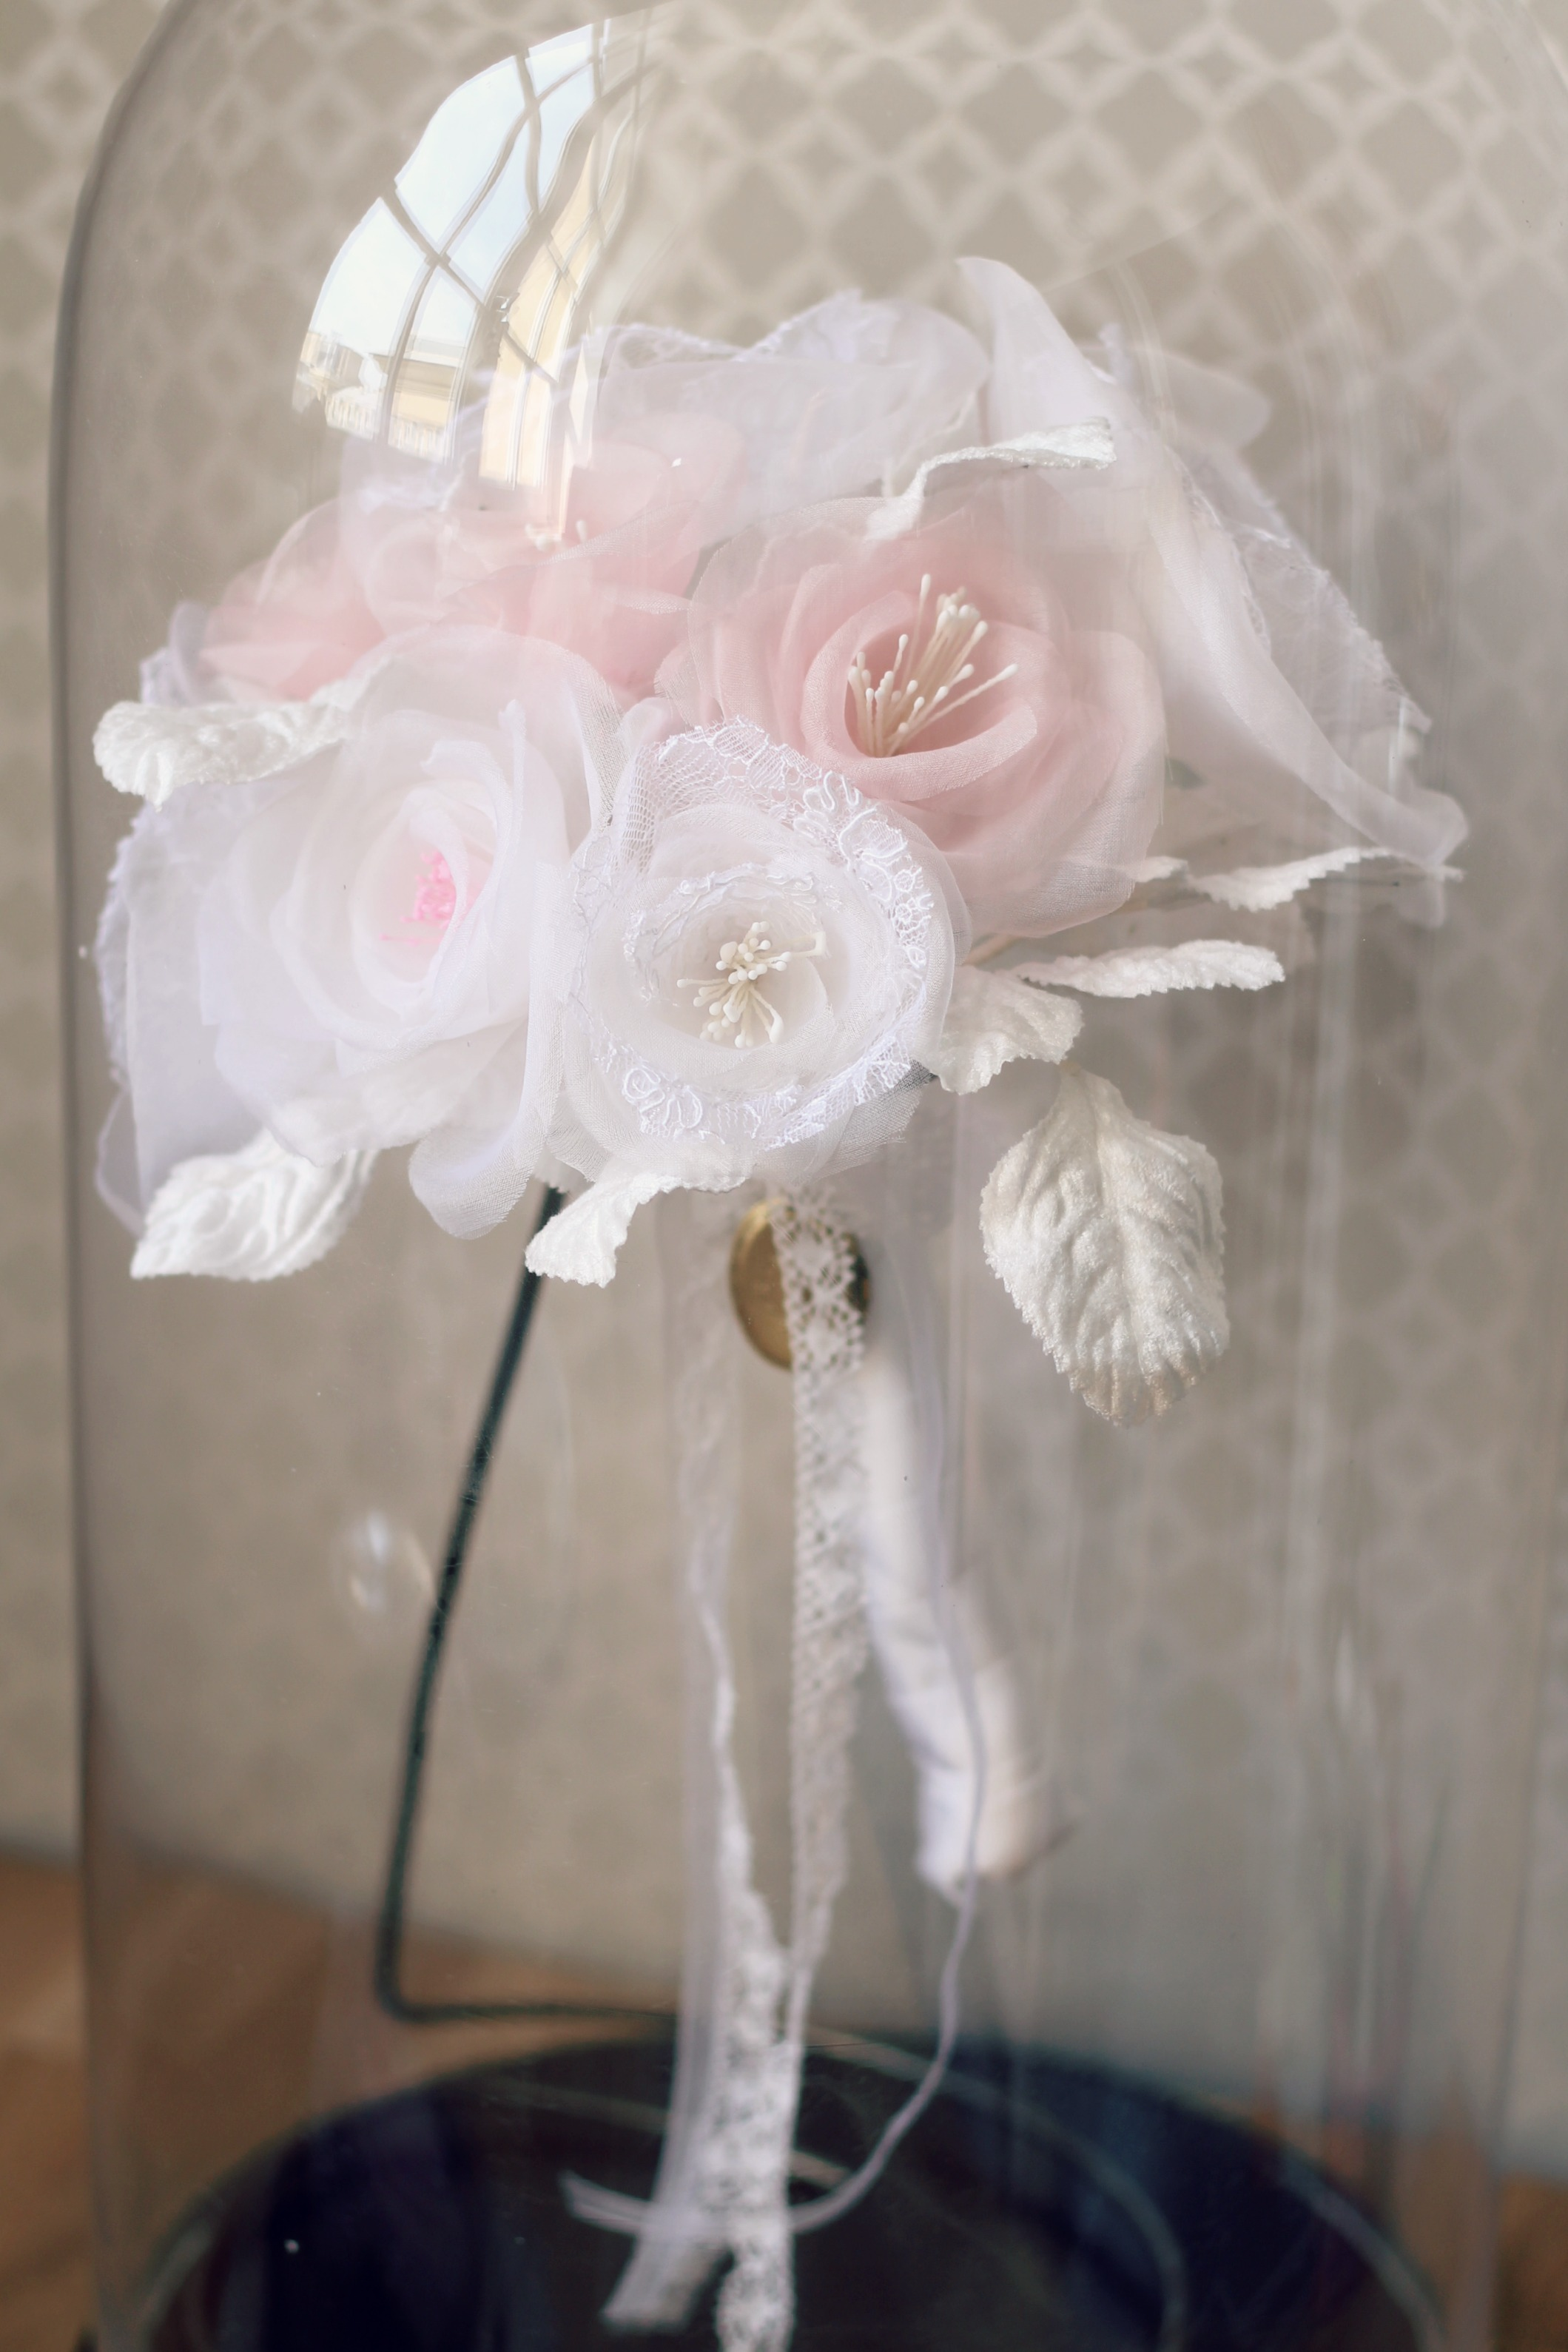 bouquets de mari e le blog d 39 h lo se bijoux de mari e. Black Bedroom Furniture Sets. Home Design Ideas